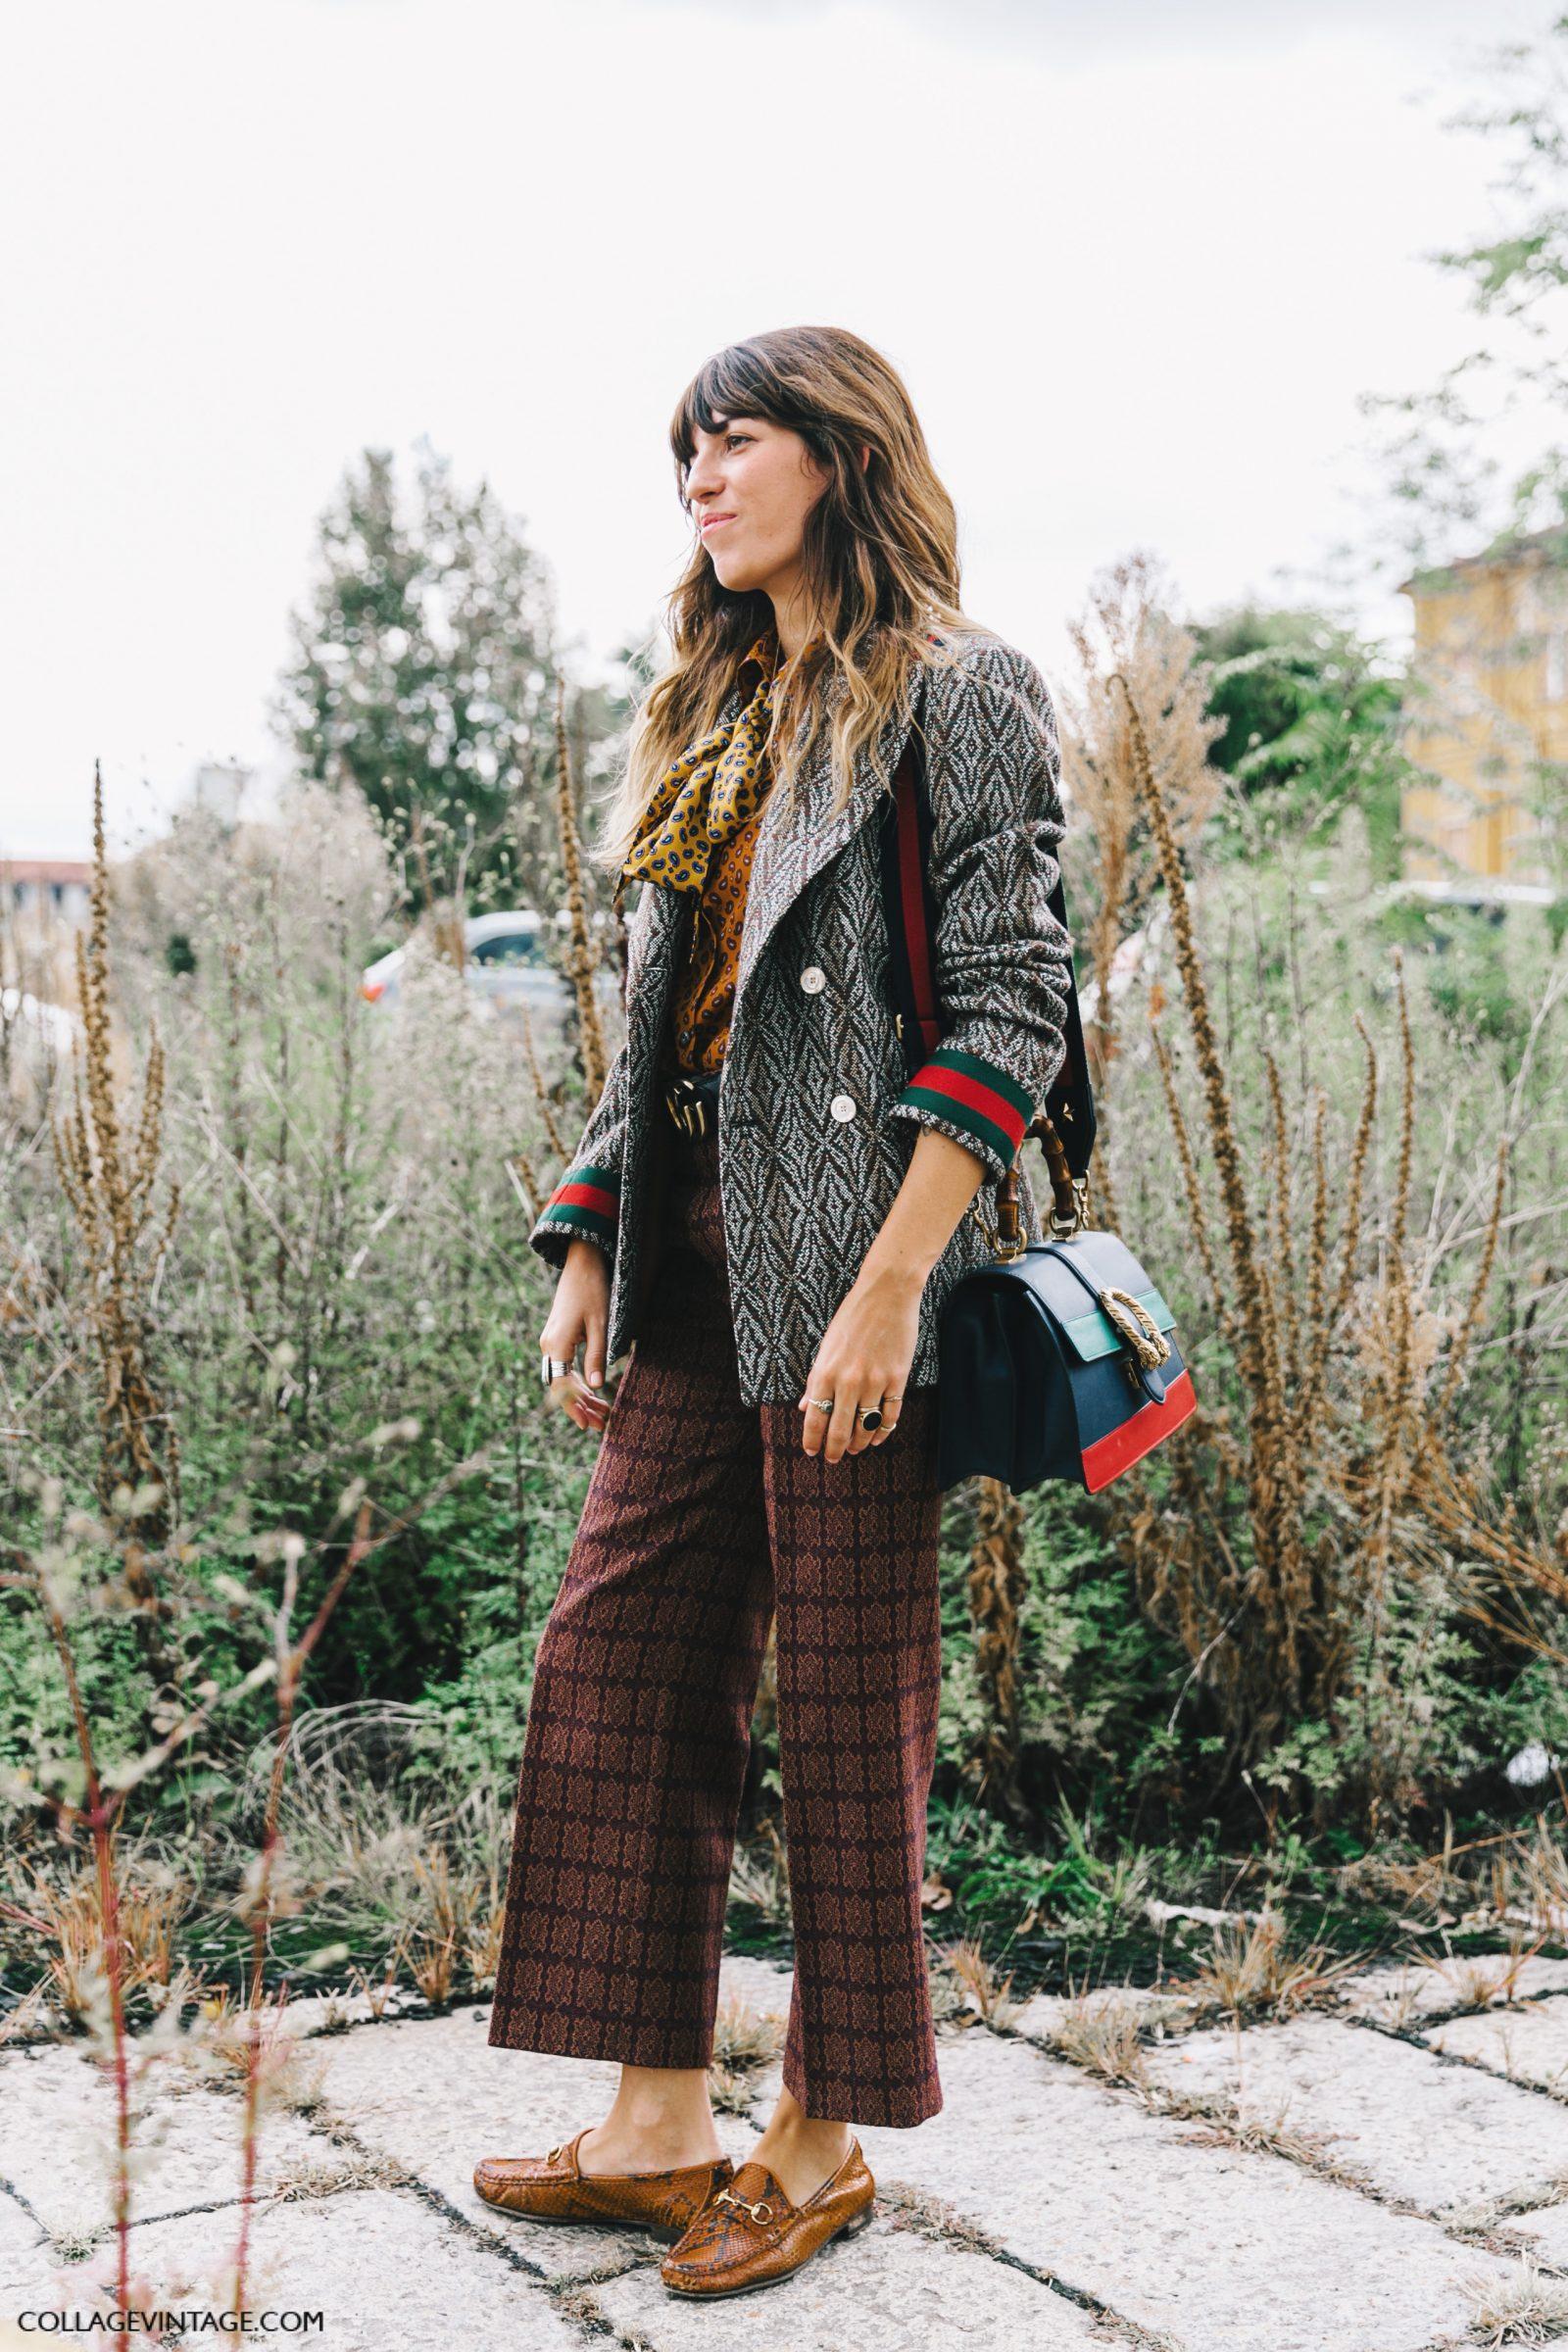 mfw-milan_fashion_week_ss17-street_style-outfits-collage_vintage-gucci-numero_21-alberta_ferreti-128